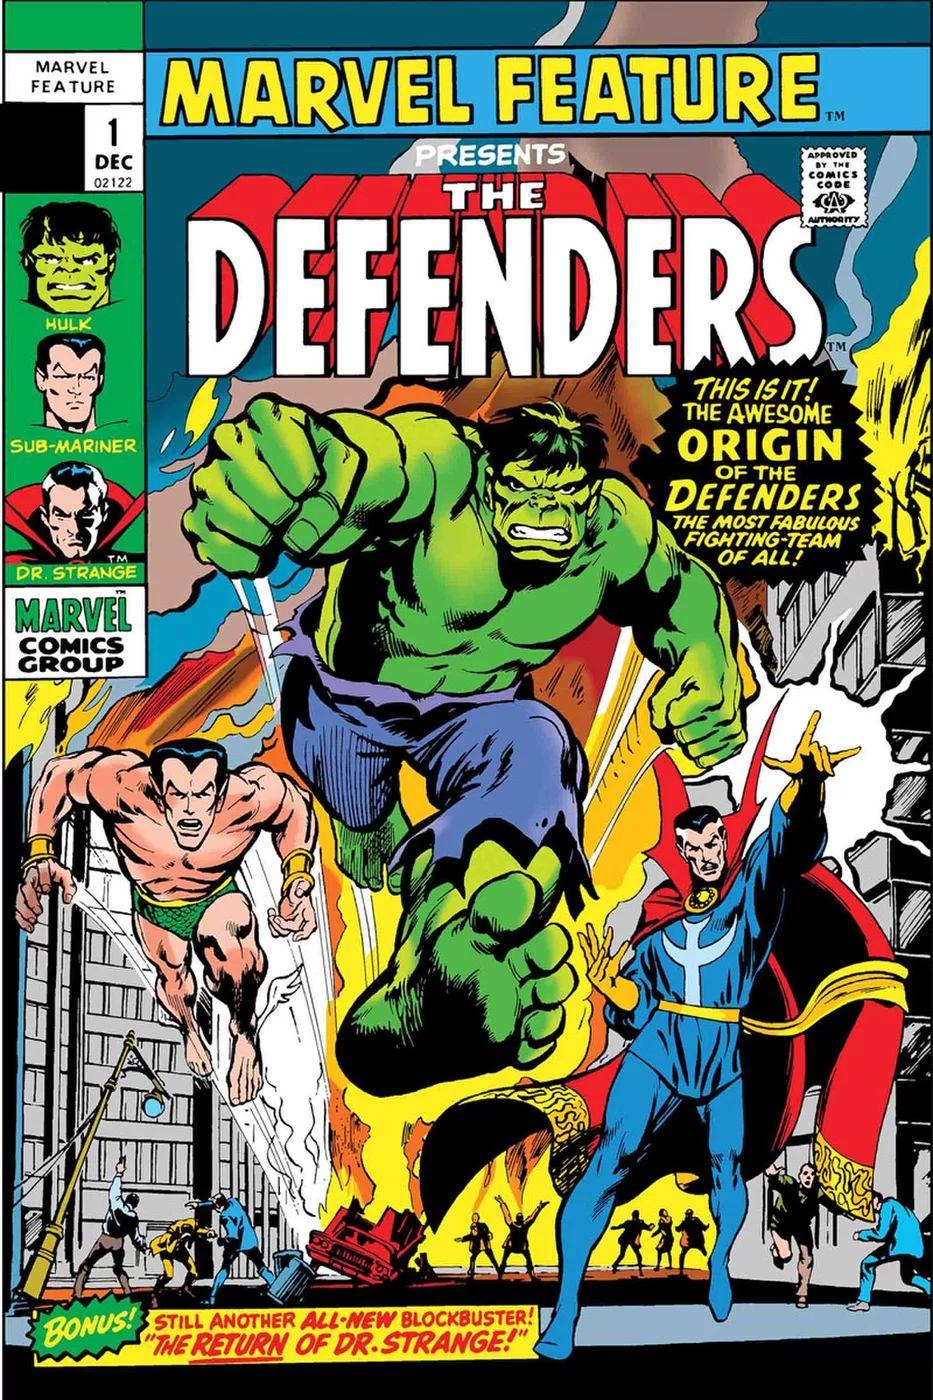 Defenders: Marvel Feature #1 Facsimile Edition